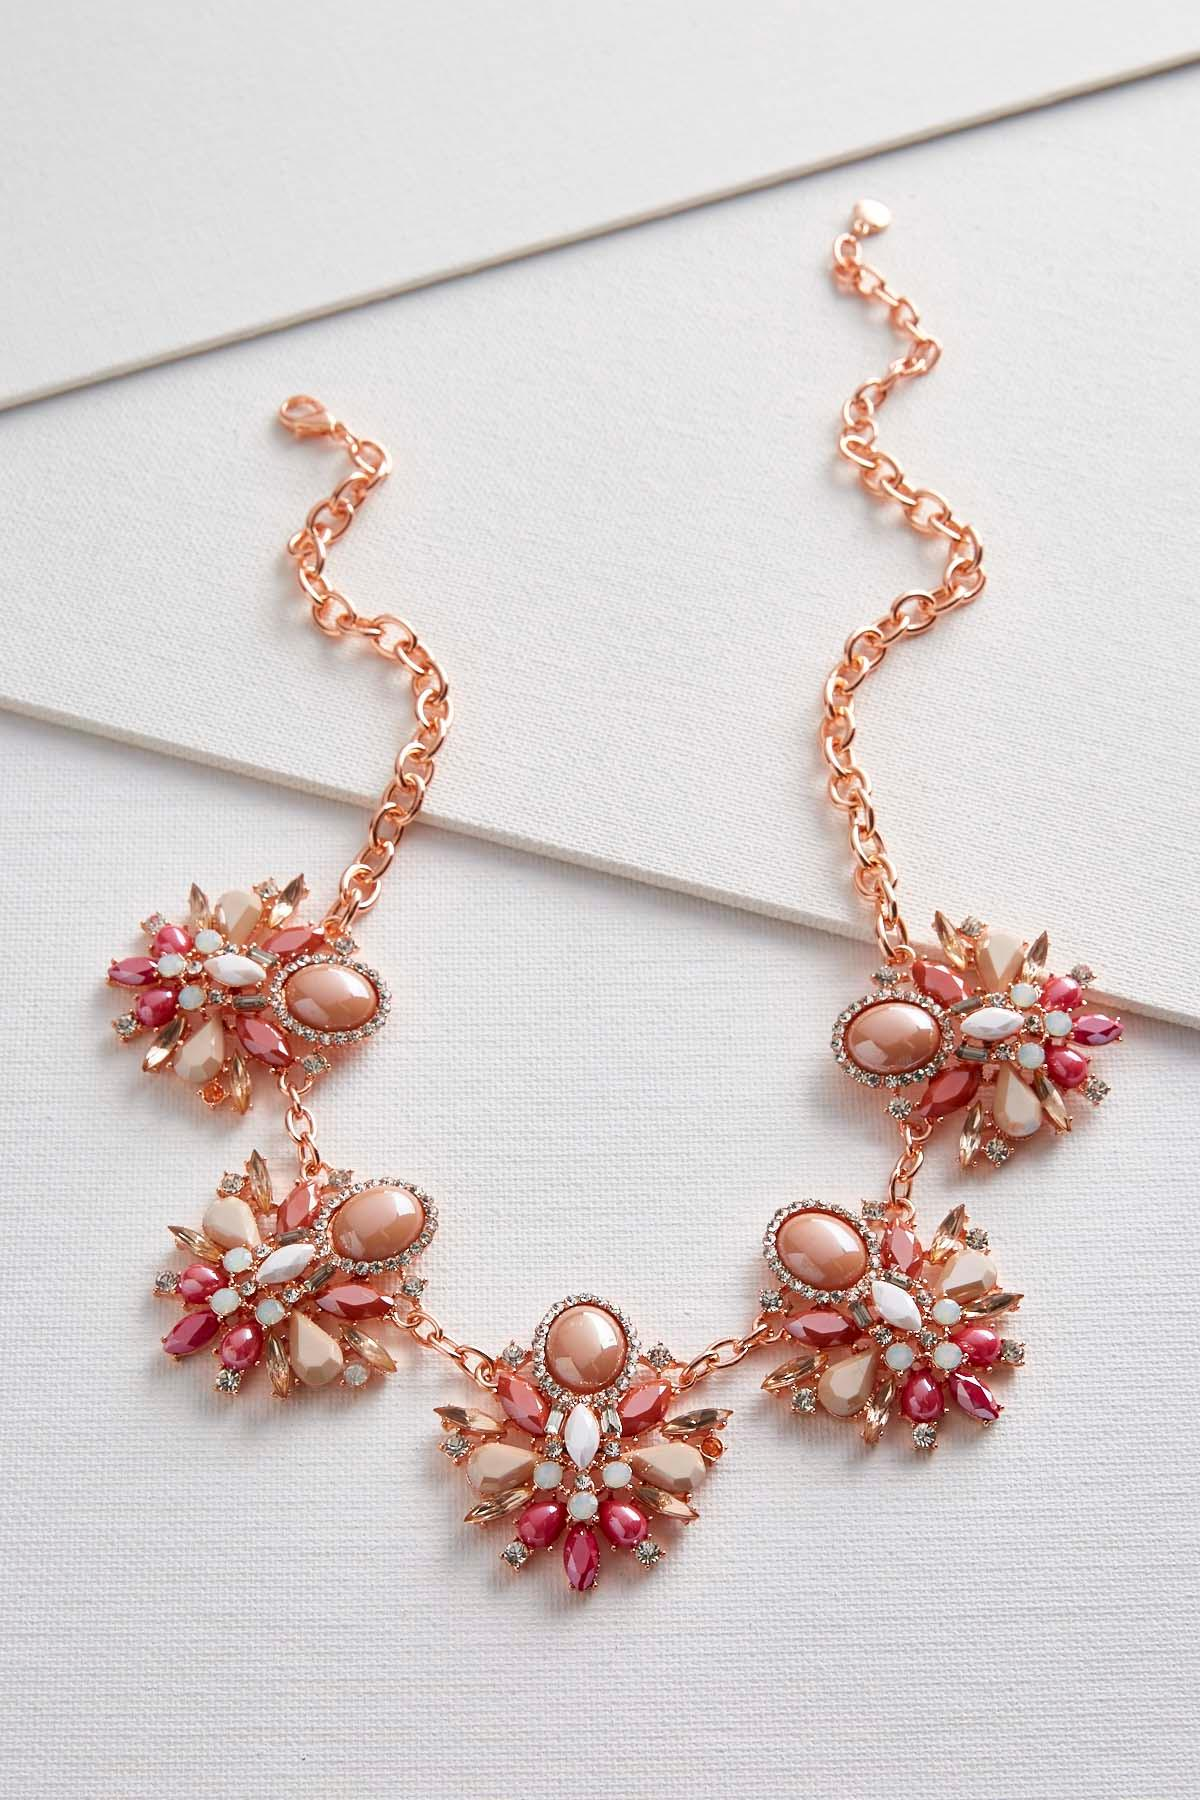 Stone Cluster Bib Necklace